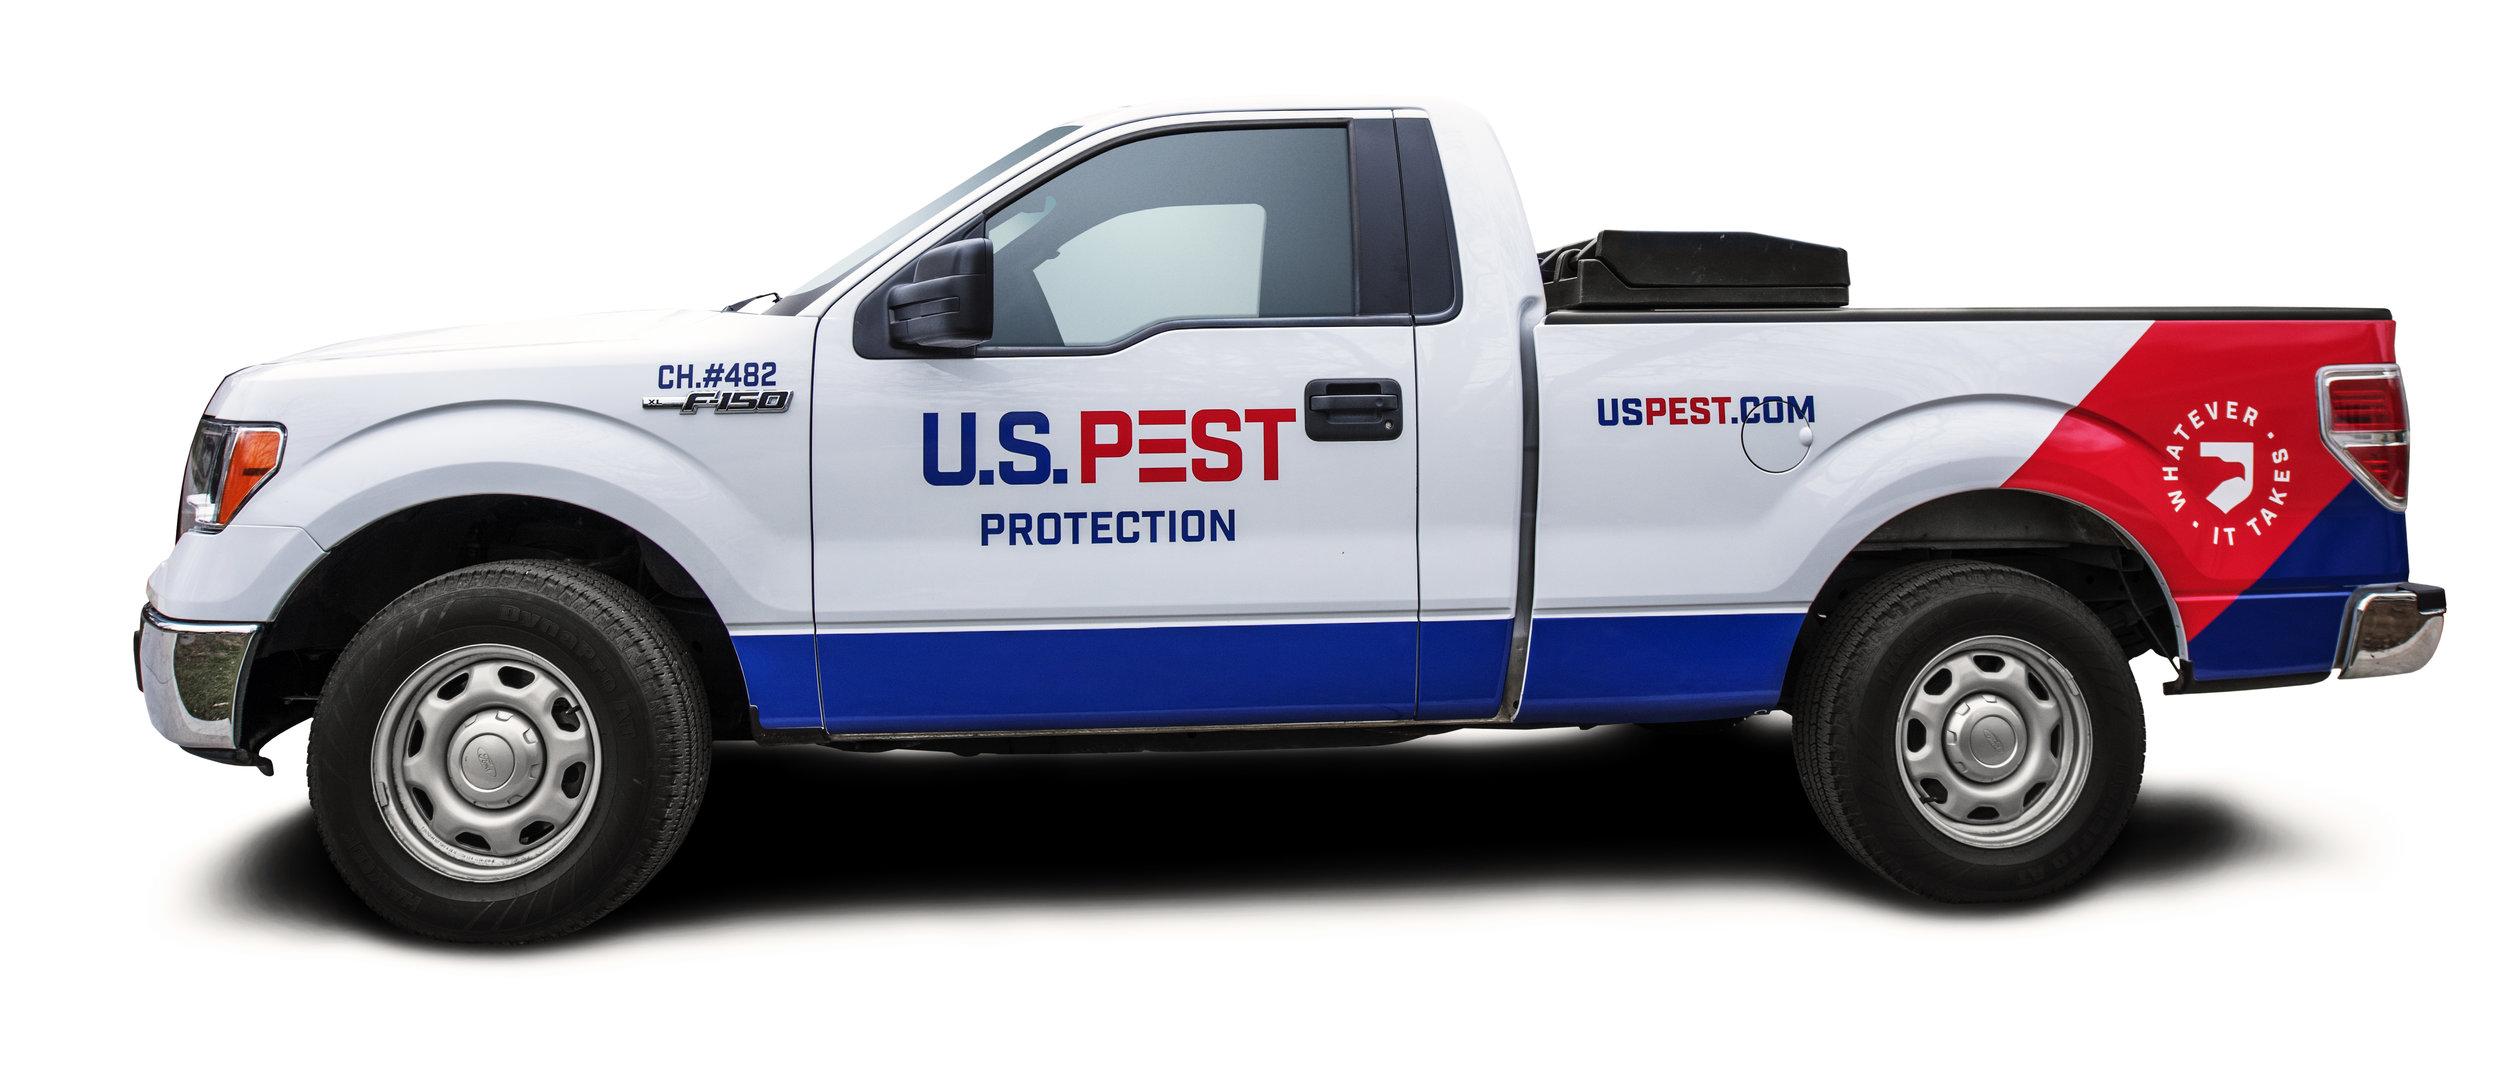 bohan | U.S. Pest New Vehicle Wrap